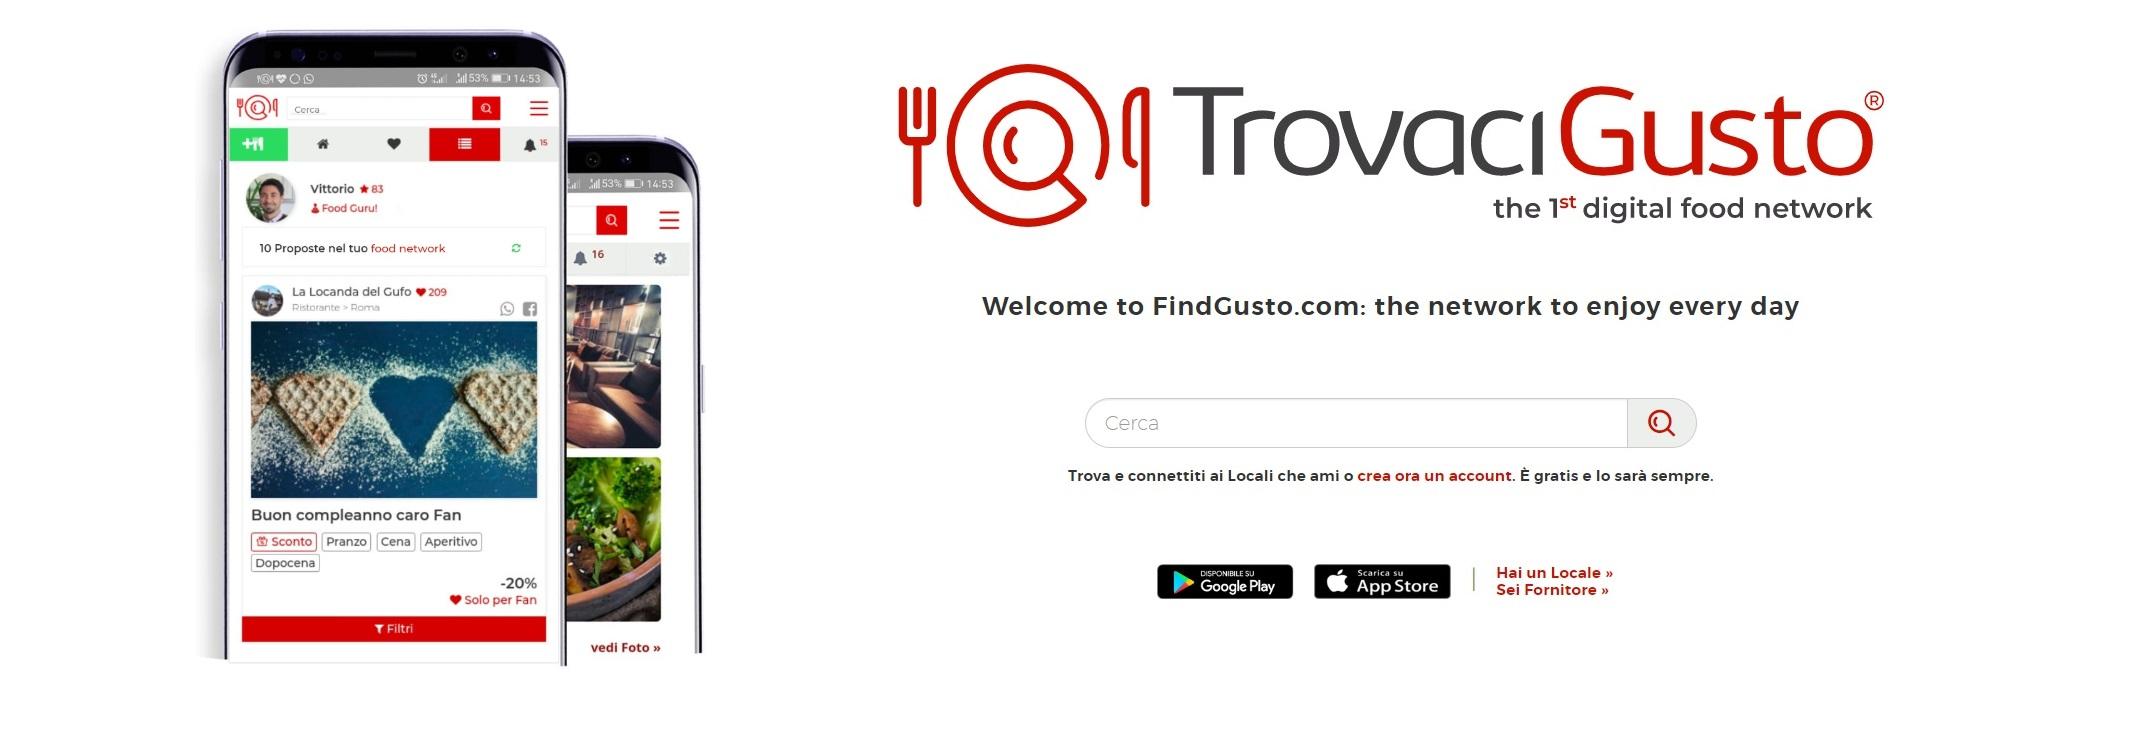 FindGusto.com